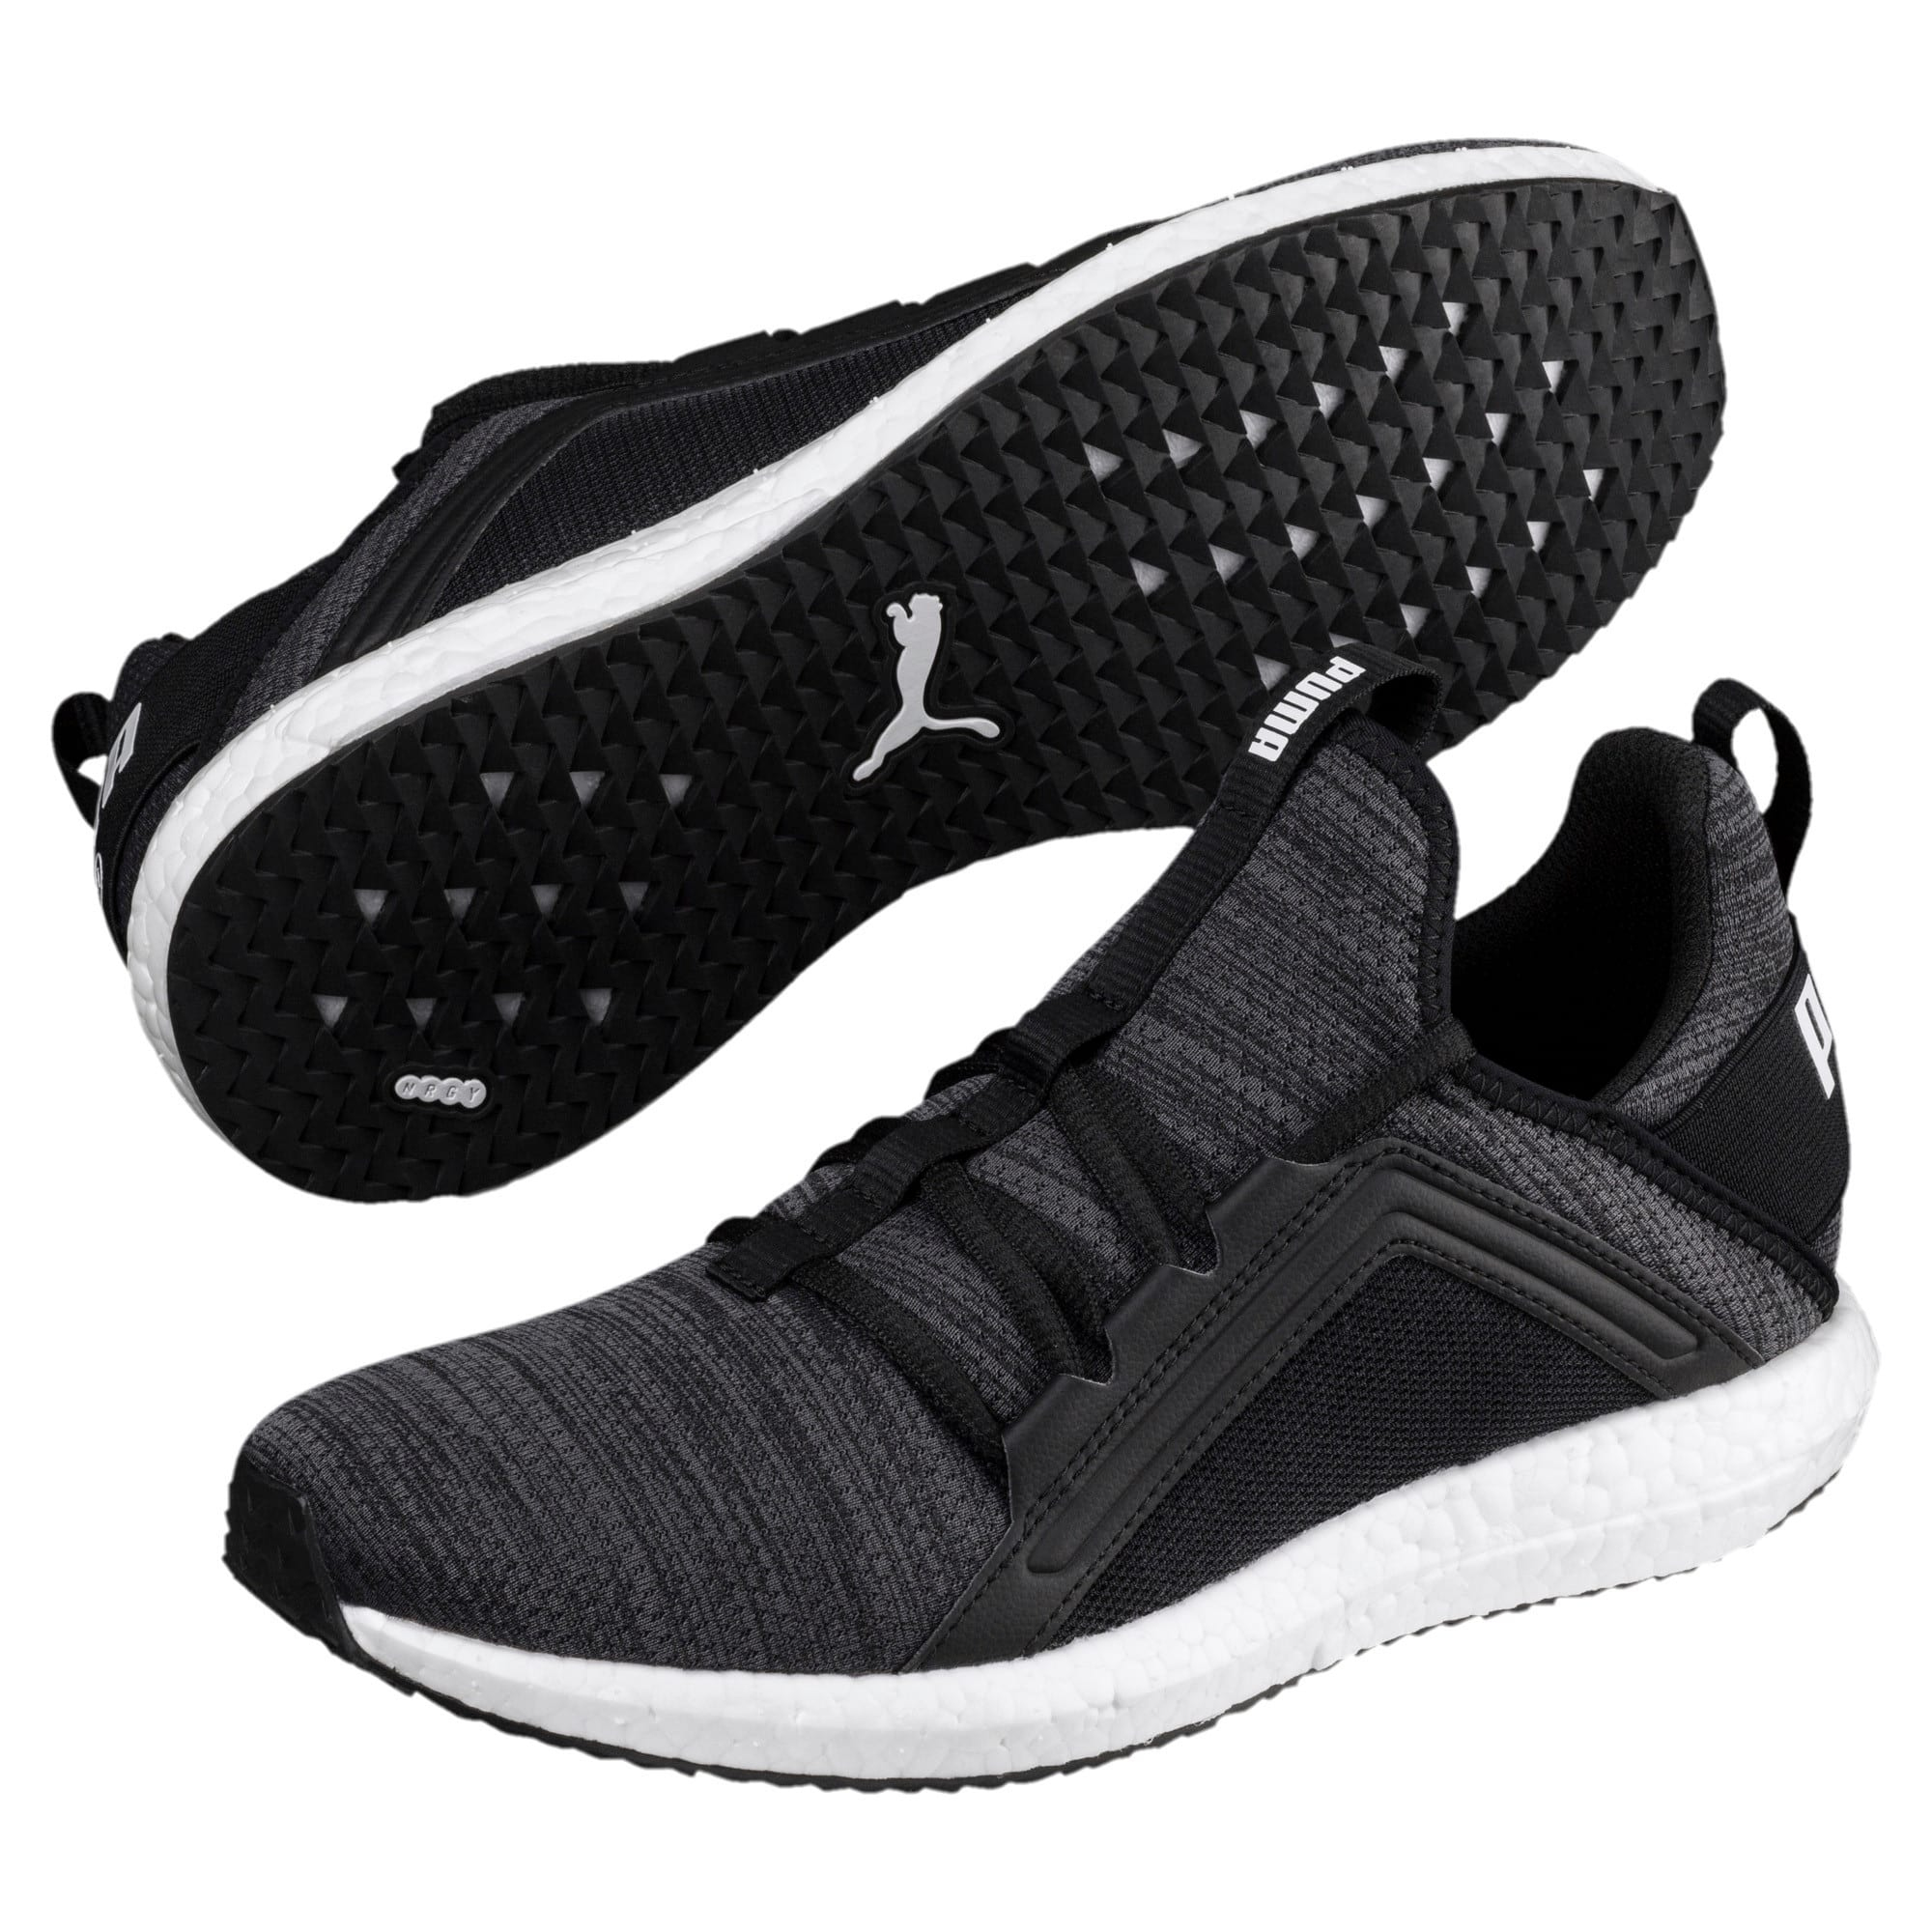 Thumbnail 6 of Mega Energy Heather Knit Women's Running Shoes, Black-Iron Gate-White, medium-IND